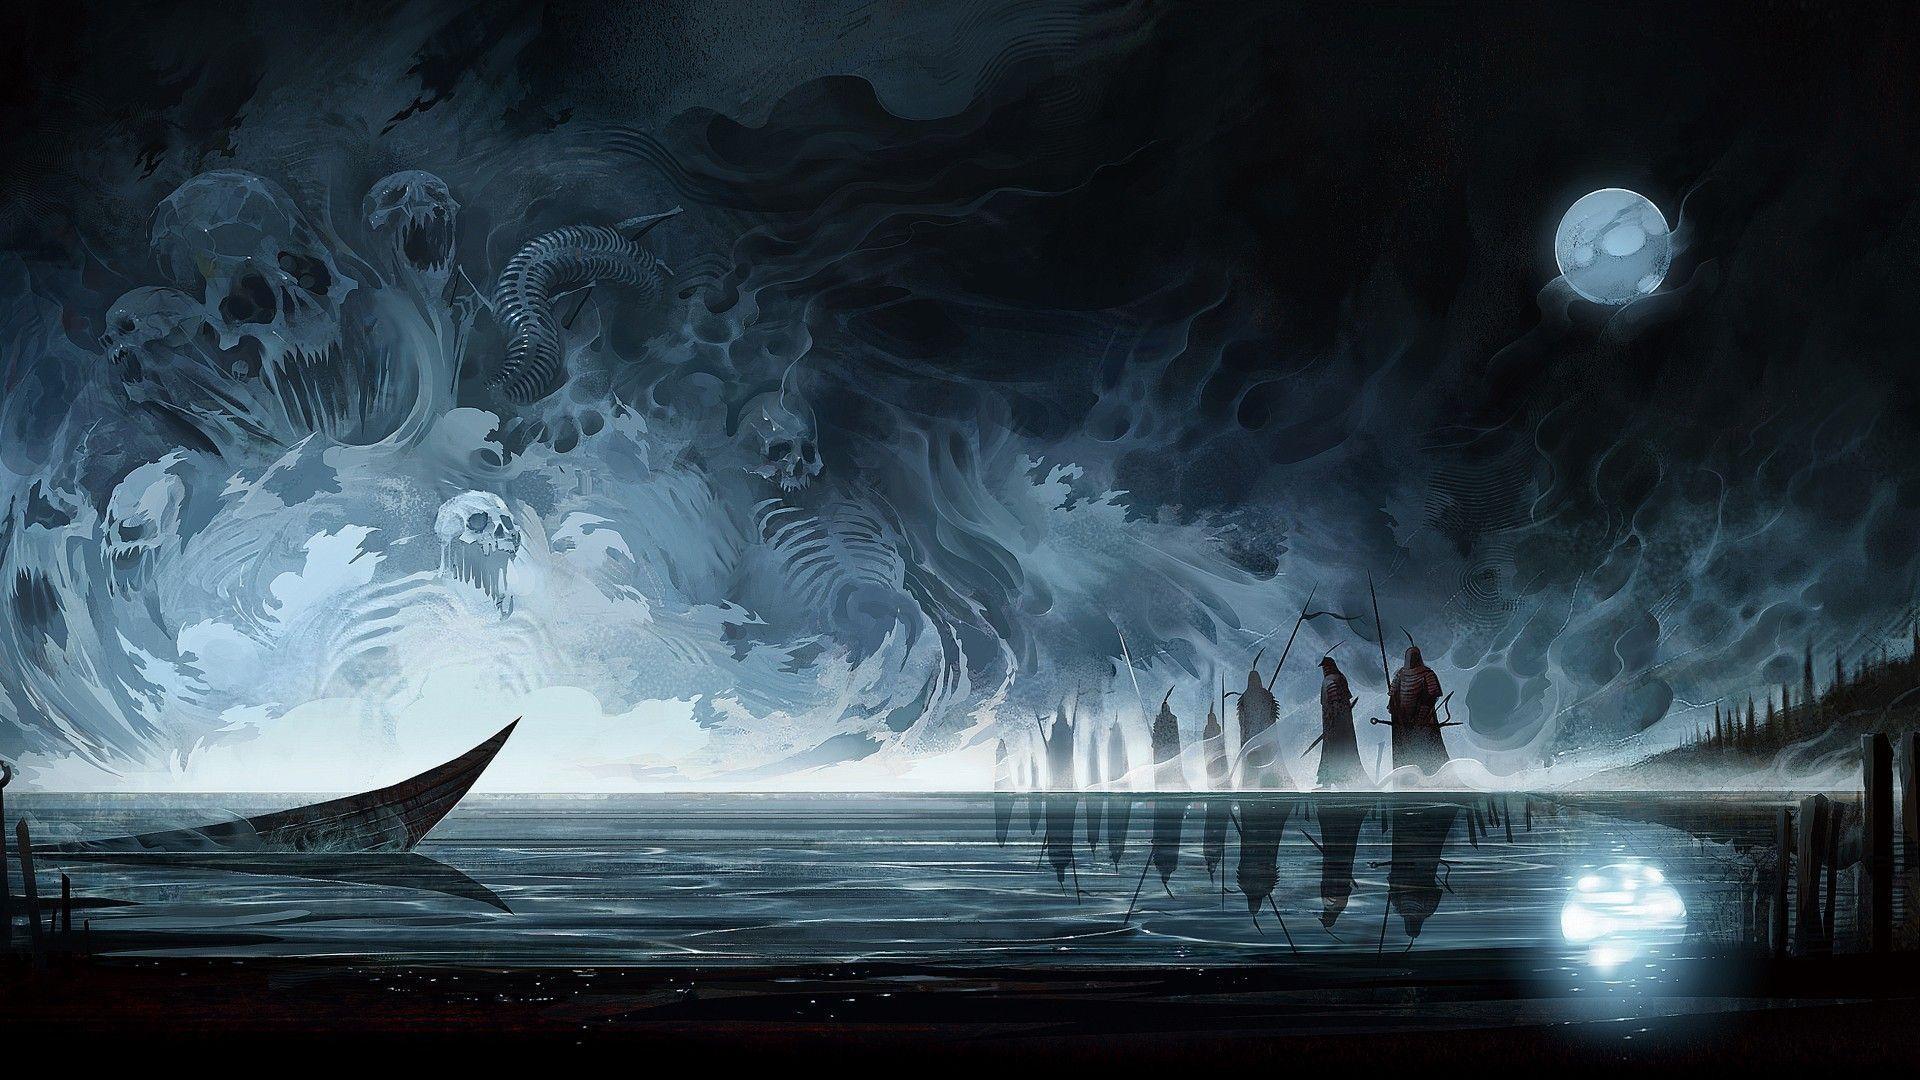 Dark fantasy wallpaper hd 69 images - Fantasy desktop pictures ...